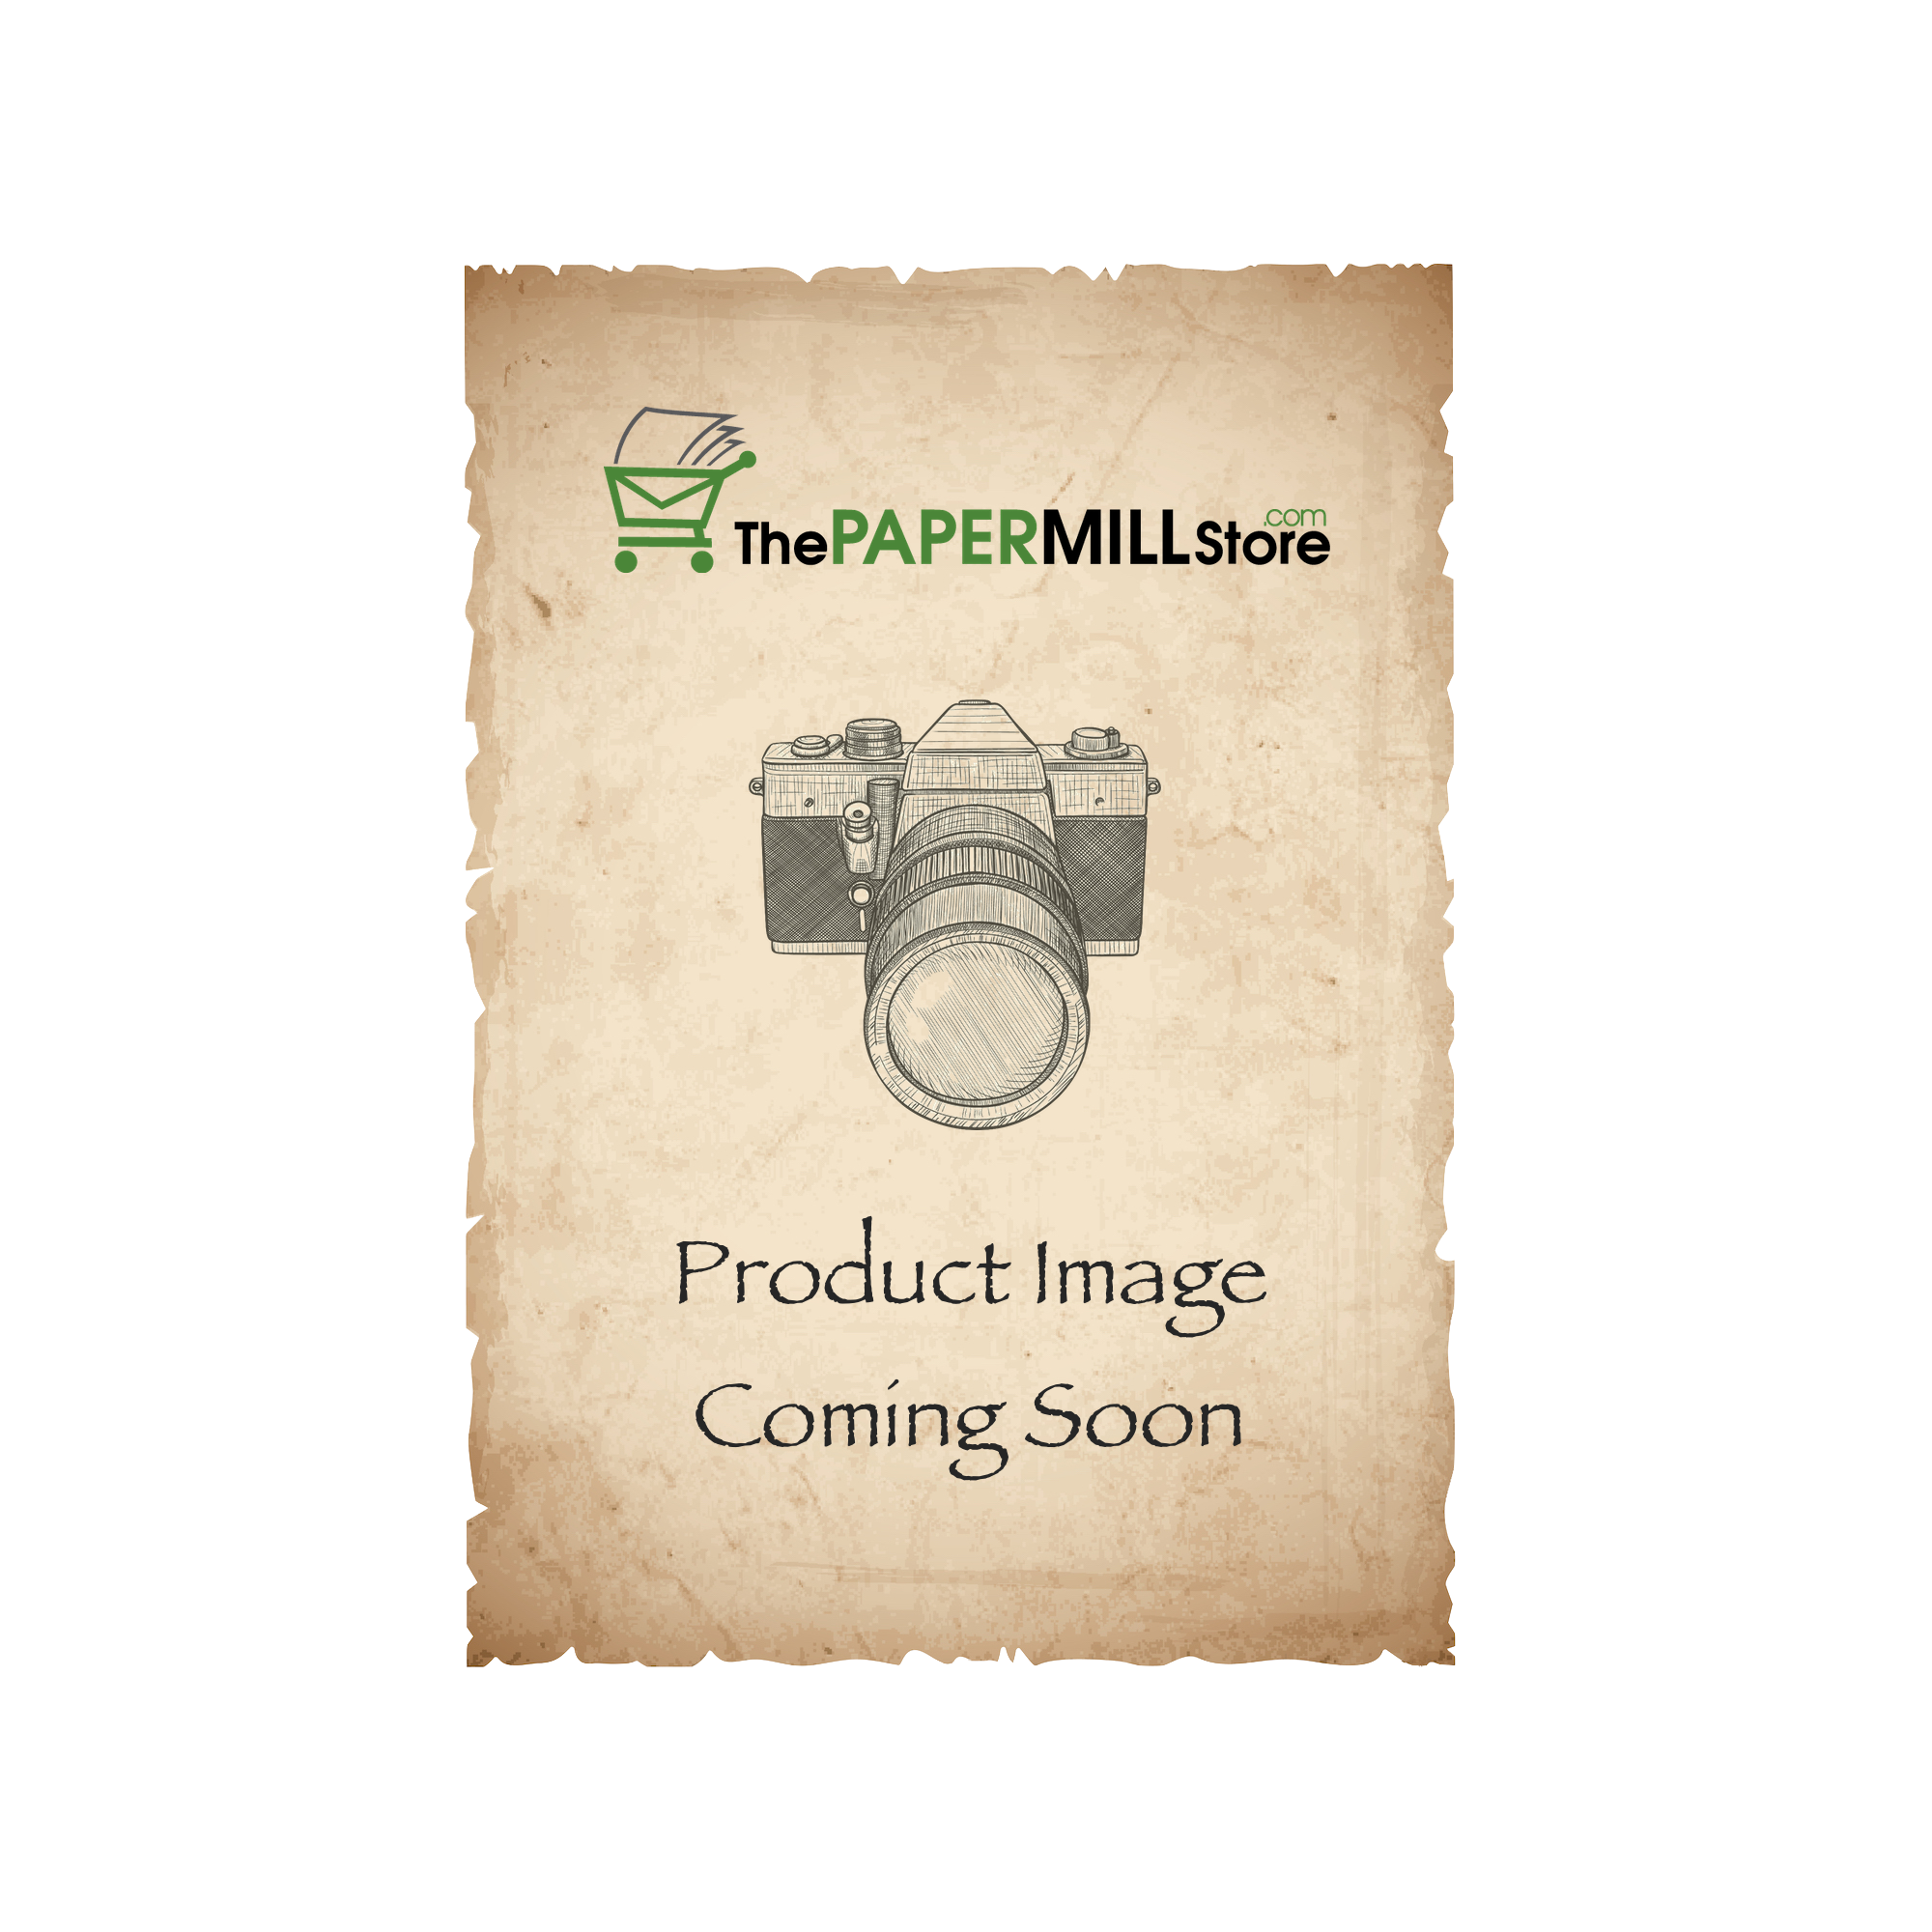 Splendorlux Copper Paper - 8 1/2 x 11 in 11.5 pt Cover Glossy C/1S 250 per Package